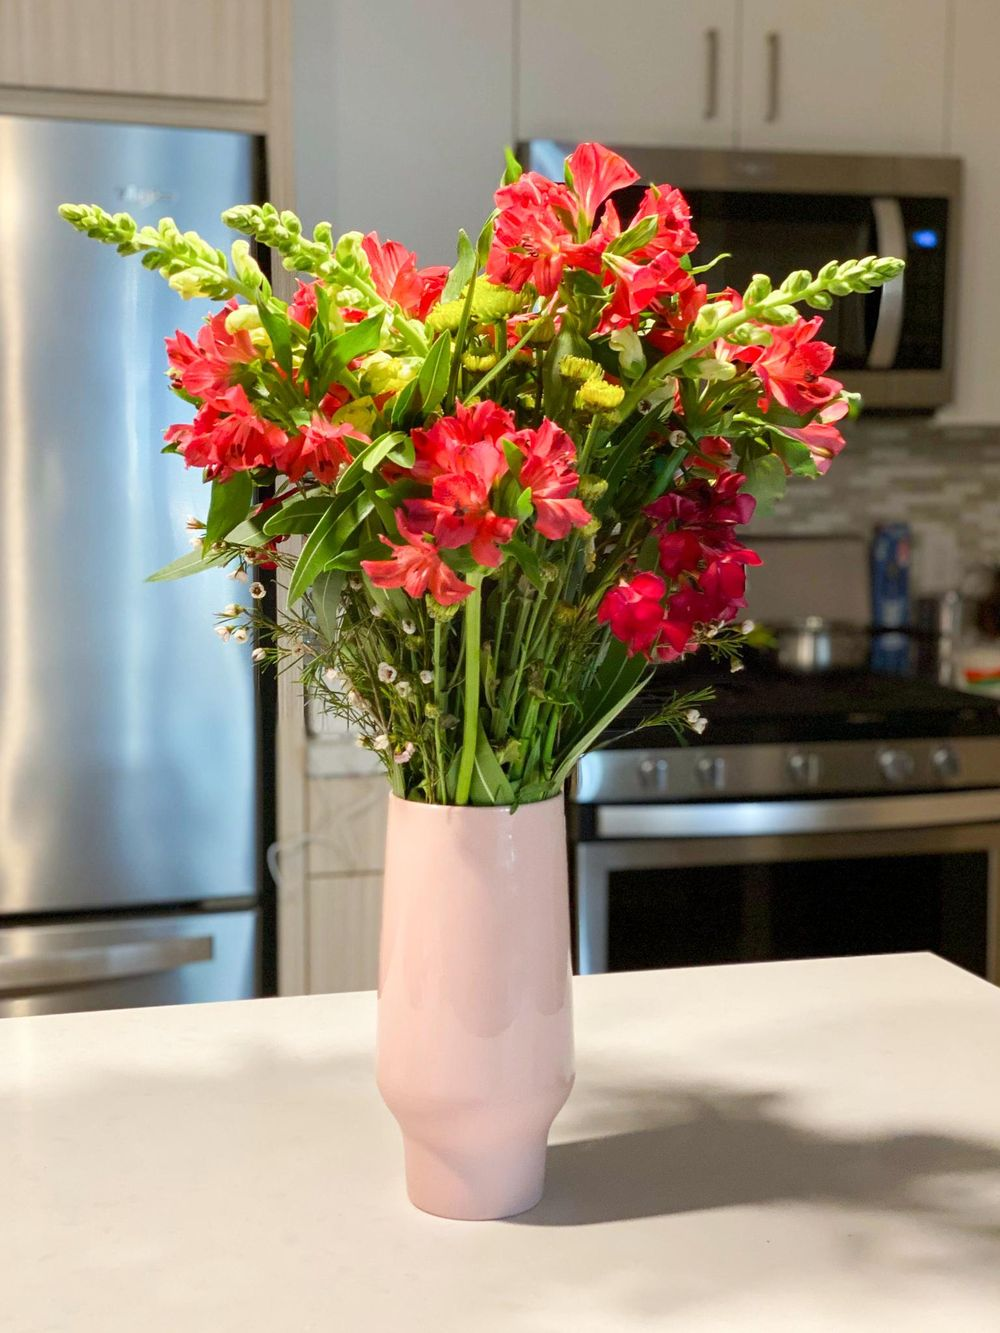 Bay Area Flower Arrangement - image 1 - student project